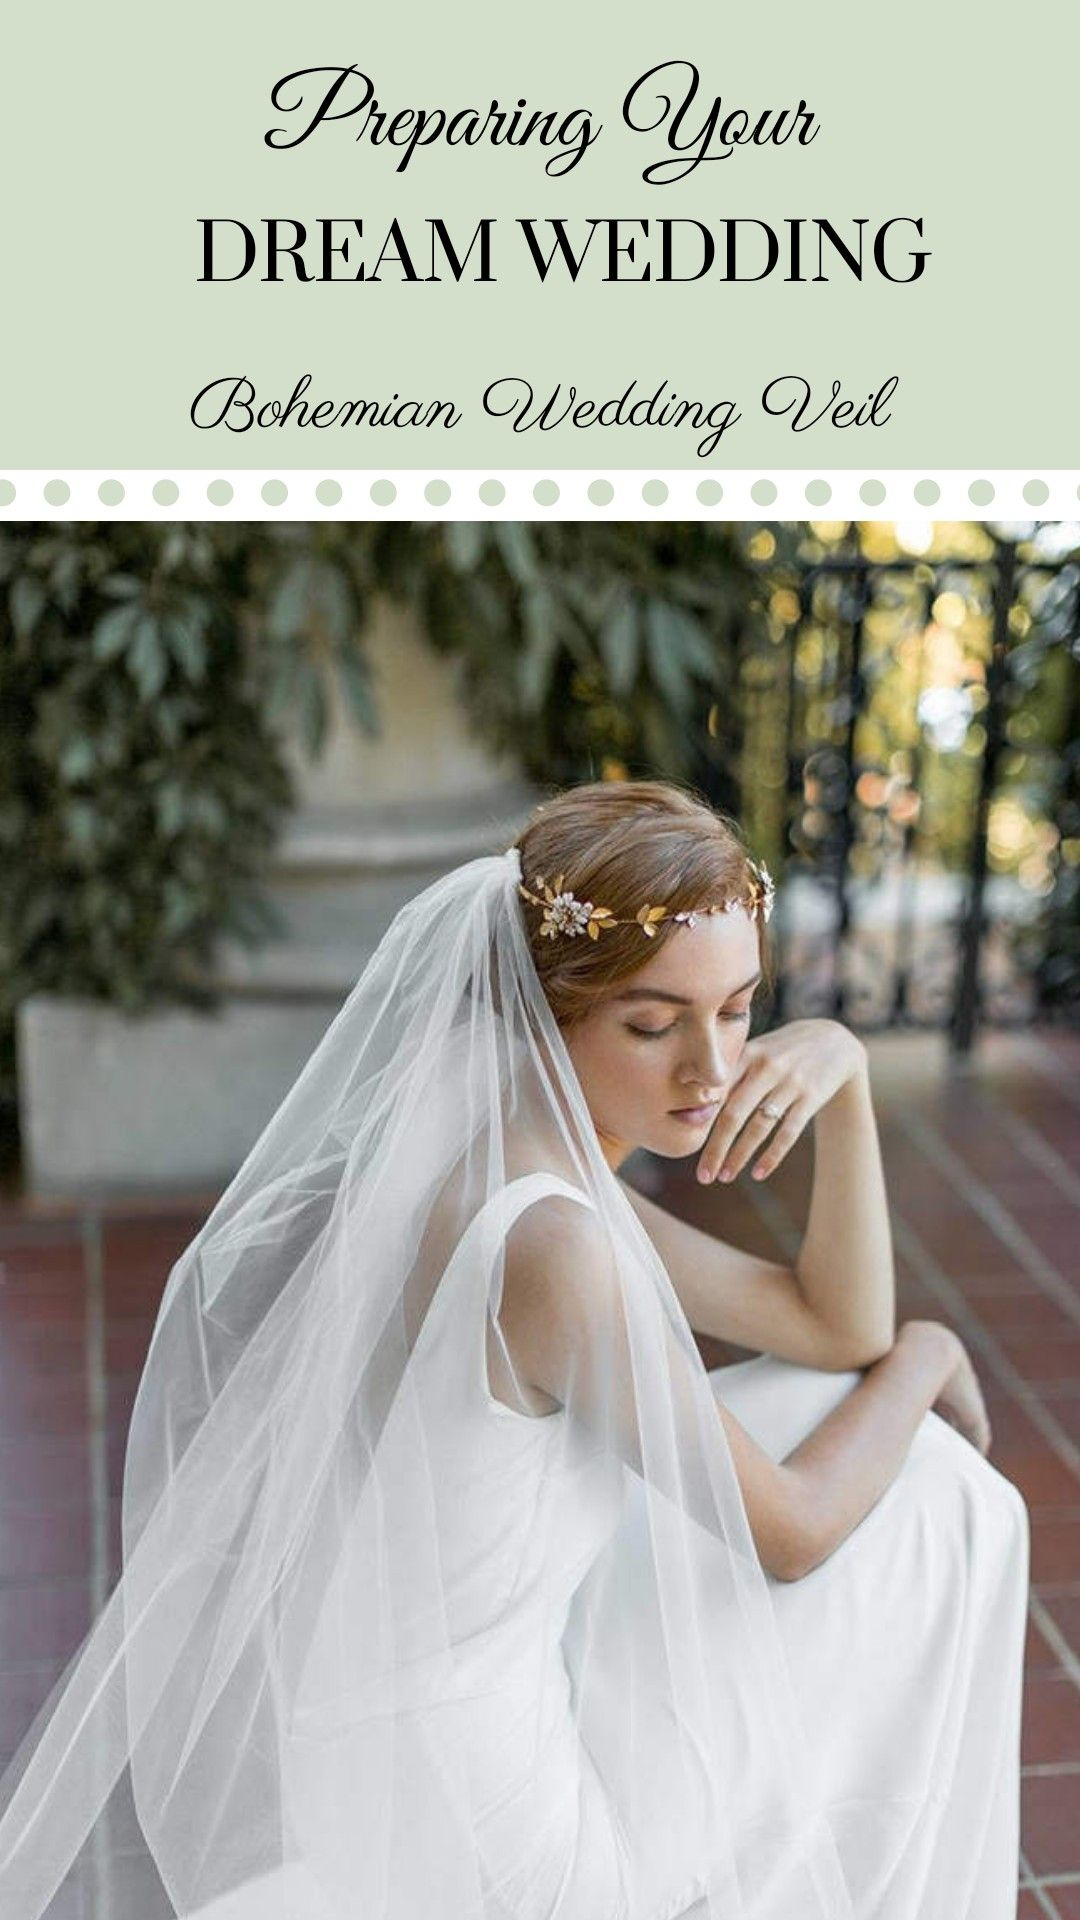 Etsy Flower Crown Veil Boho Veil Bohemian Weddingveil Draped